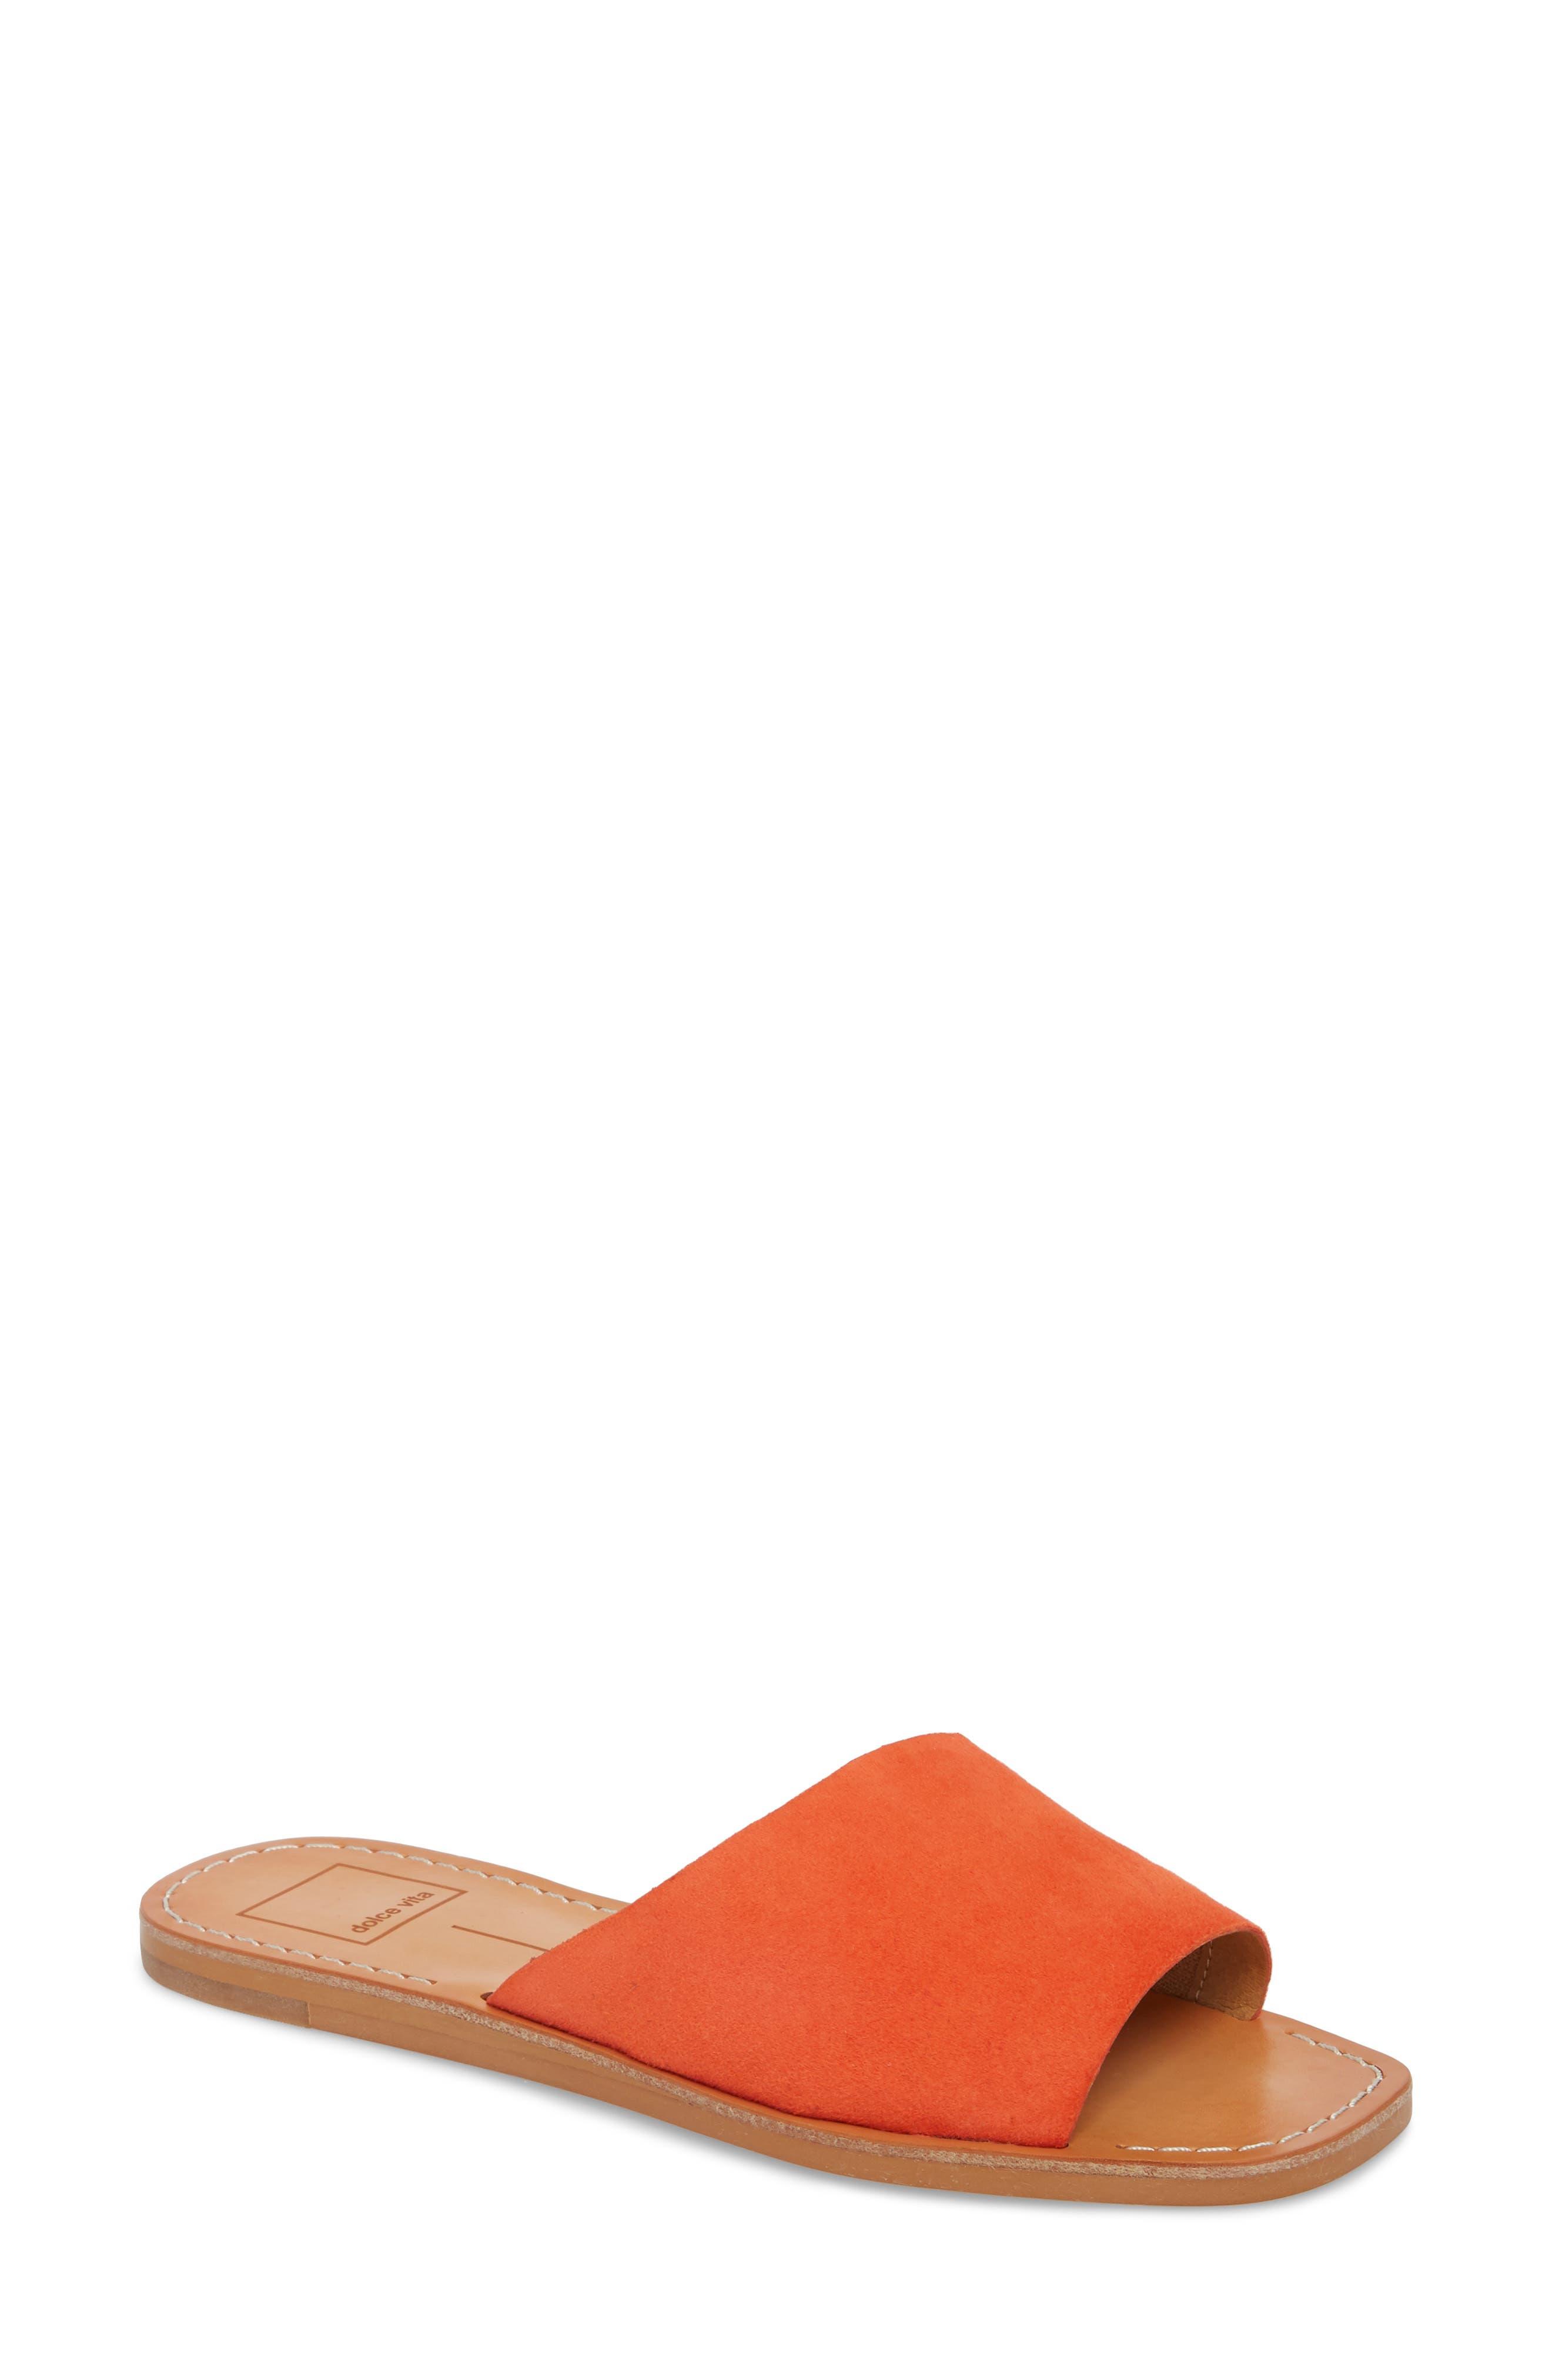 Cato Genuine Calf Hair Slide Sandal,                             Main thumbnail 6, color,